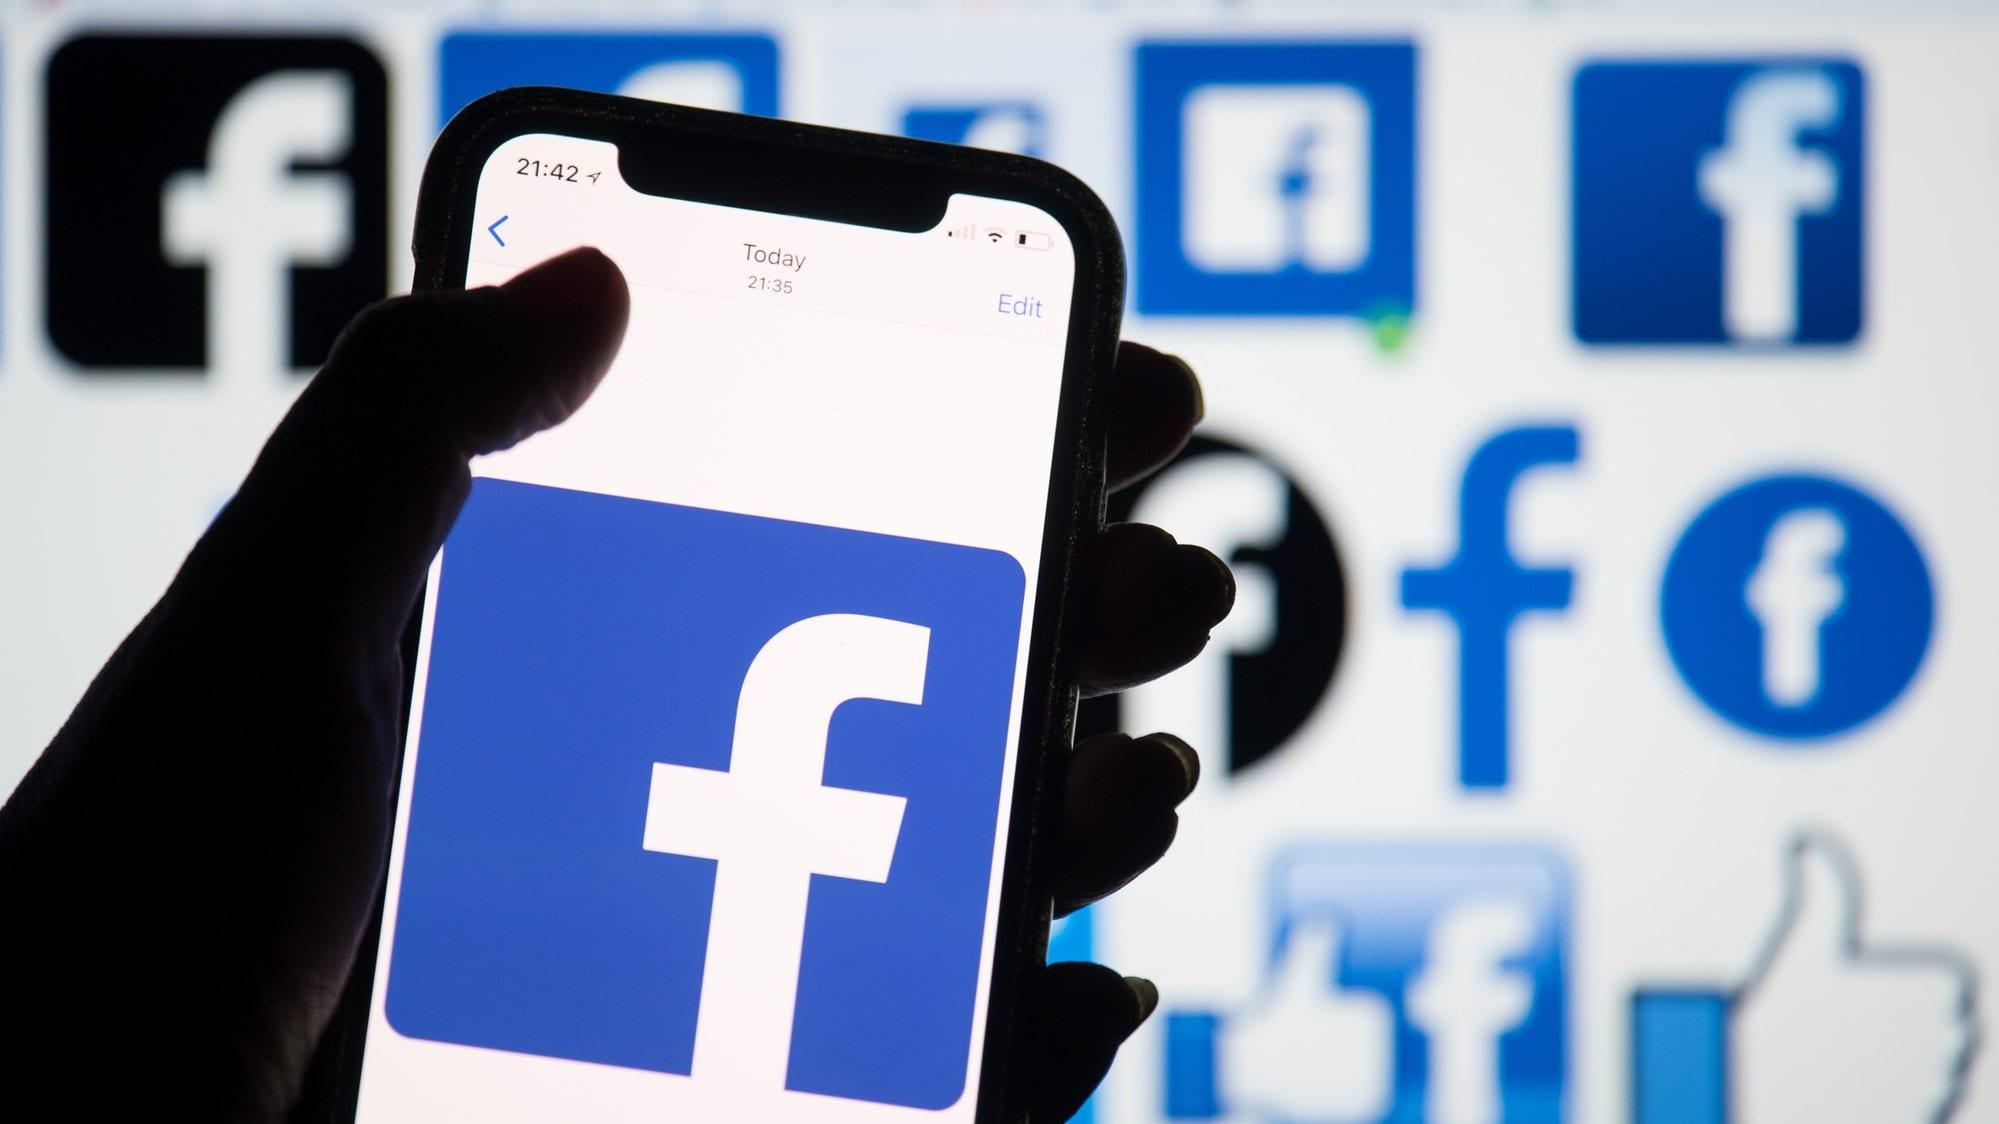 Facebook: crollano i download, a vincere è TikTok